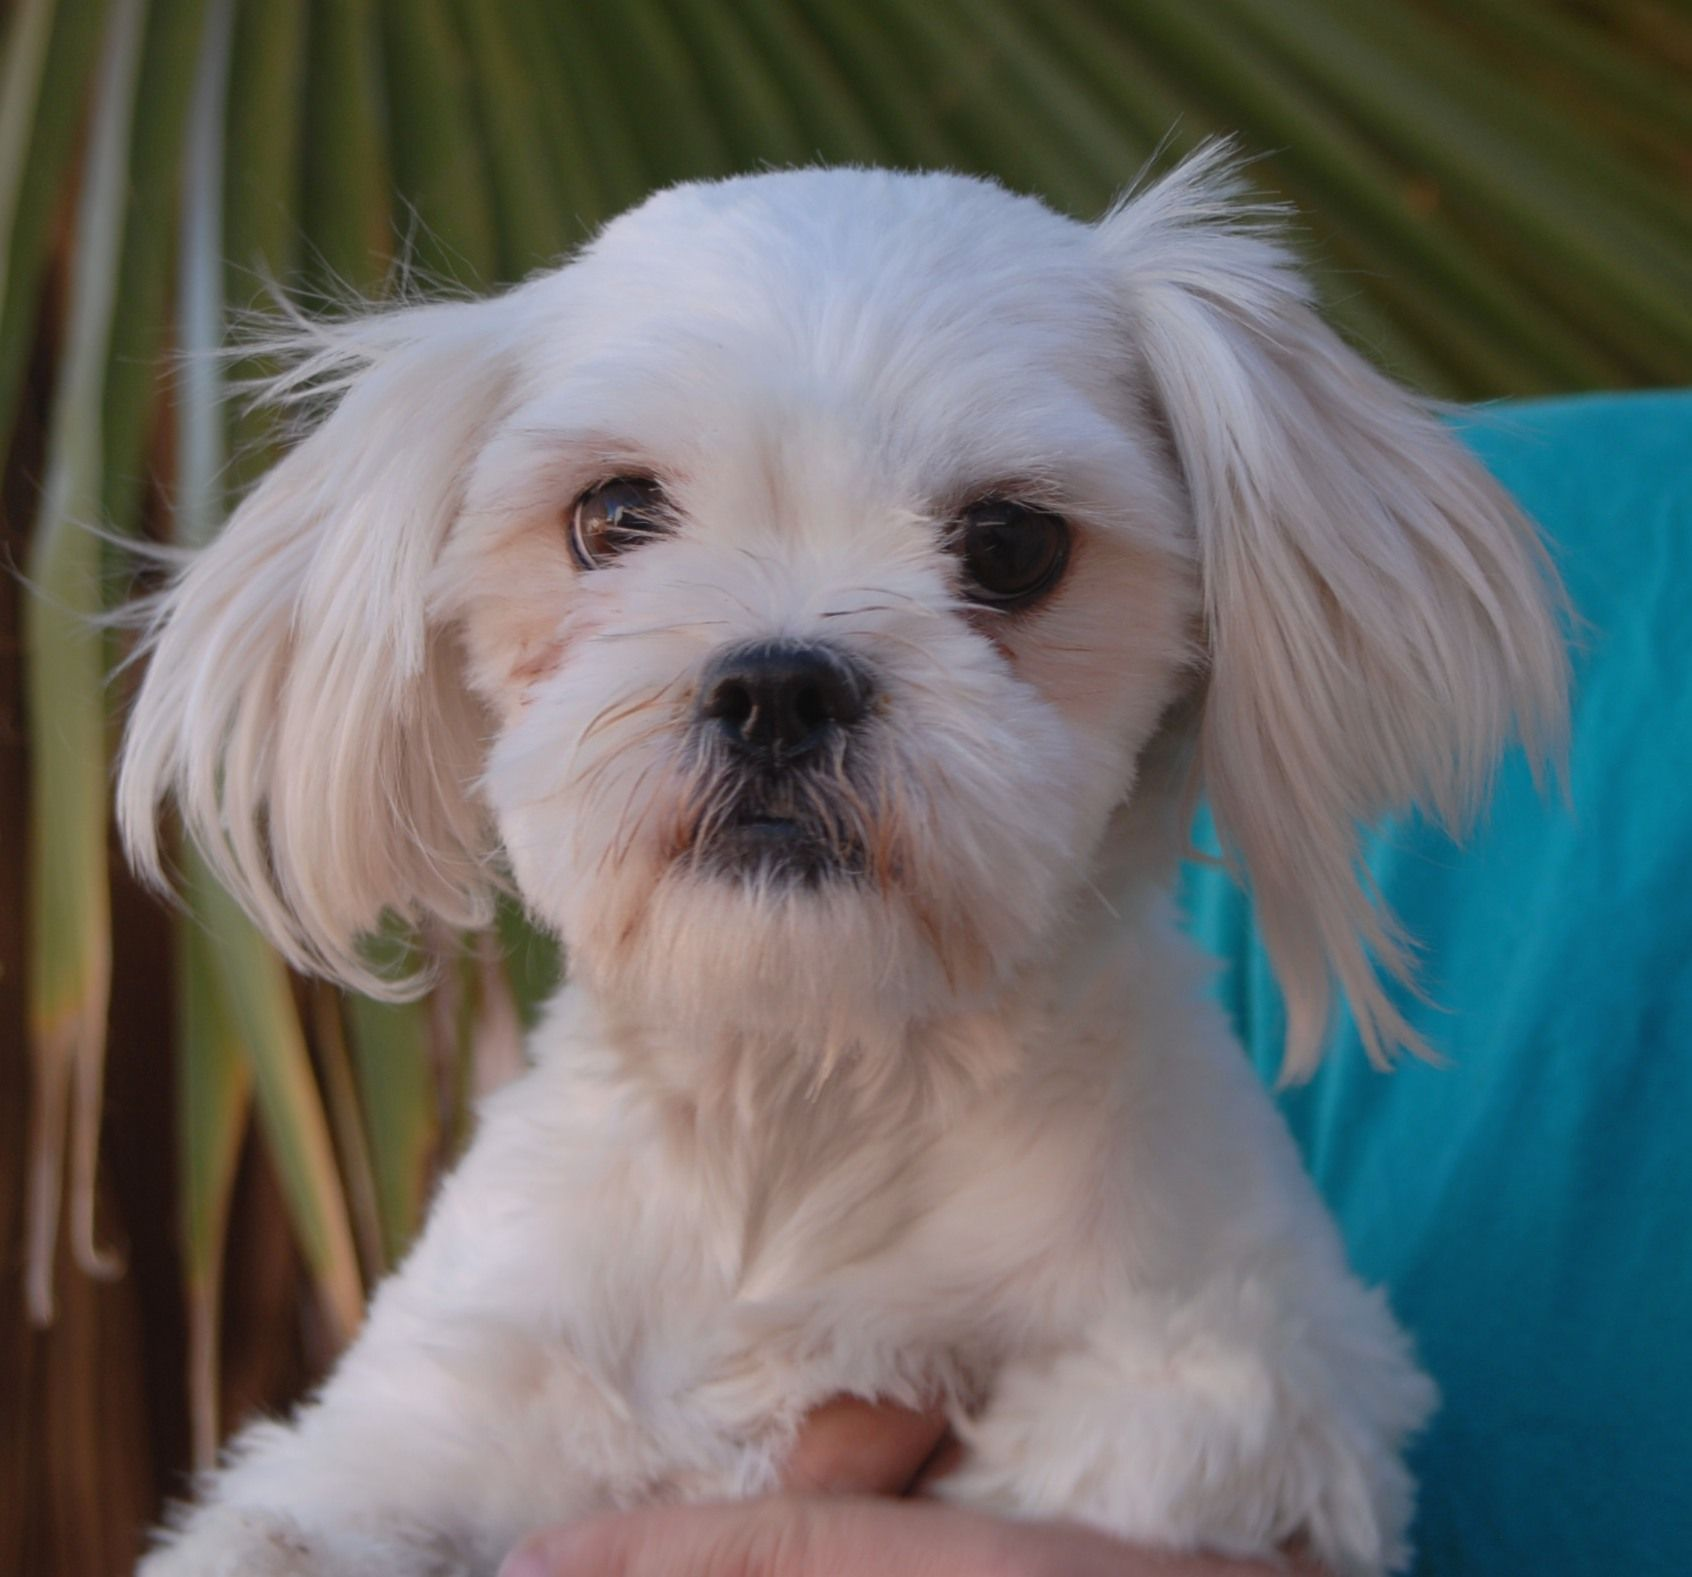 Bridgette Is A Bashful Junior Puppy Longing For Stability And Routine She Is A Maltese Shih Tzu Mix 10 M Dog Potty Training Dog Body Language Dog Adoption